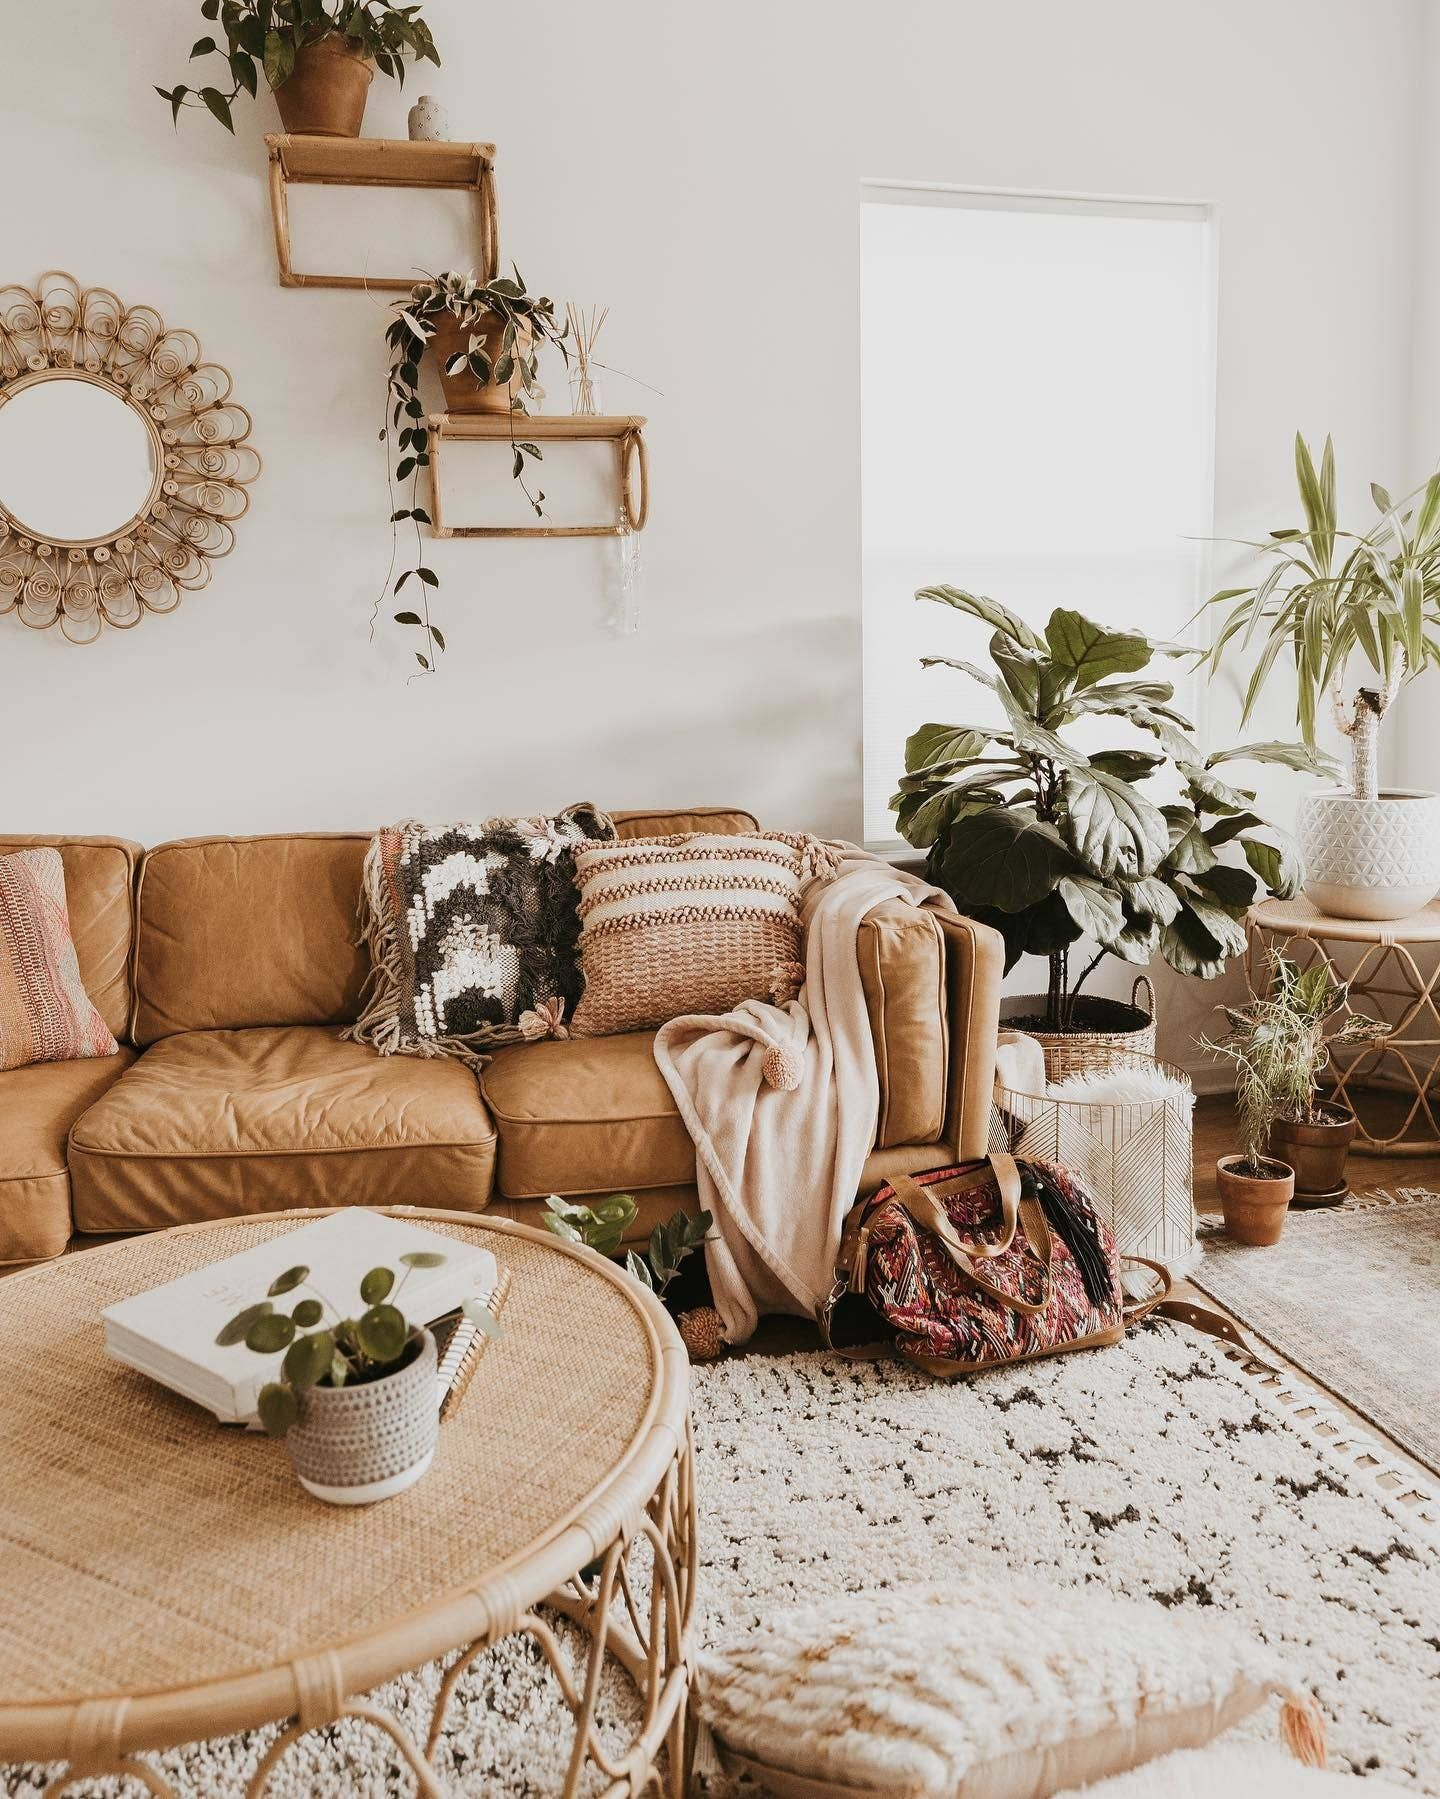 Best Timber Pebble Gray Sofa In 2020 Boho Living Room Room 400 x 300